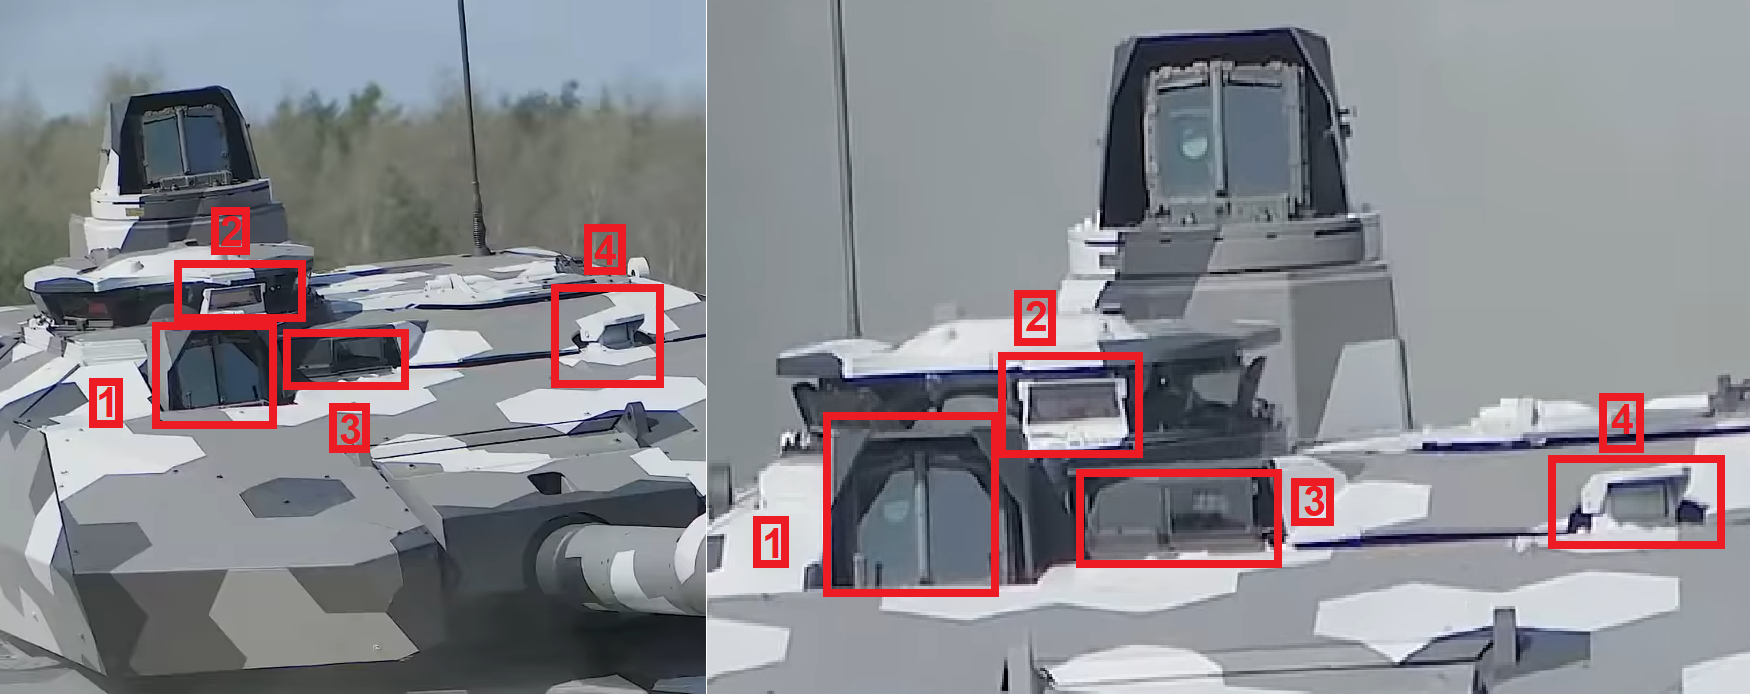 Rheinmetall – MBT 130 mm Gun - YouTube.png